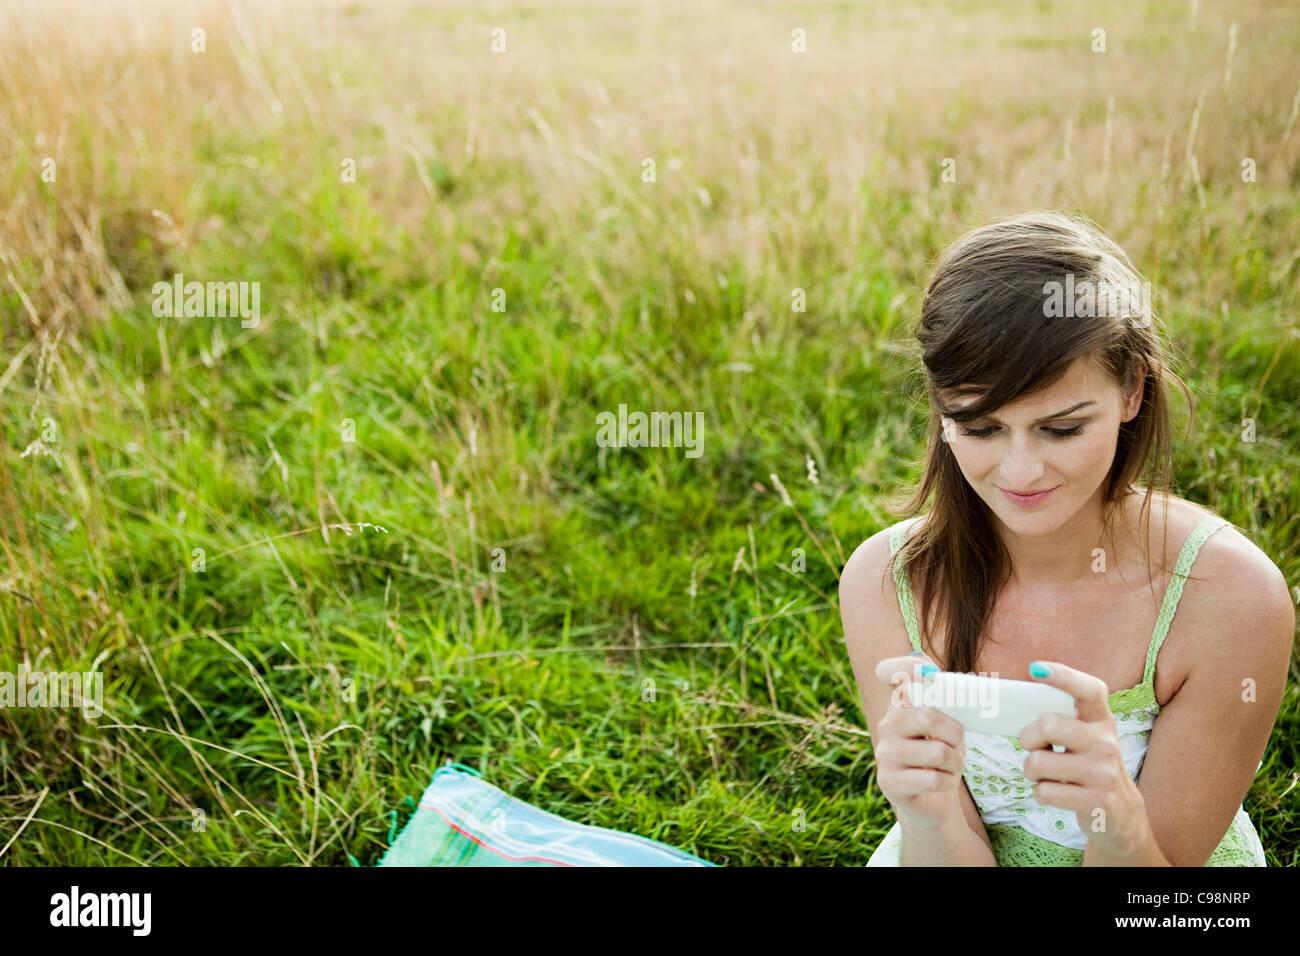 Mujer joven busca campo Dispositivo de mano Imagen De Stock